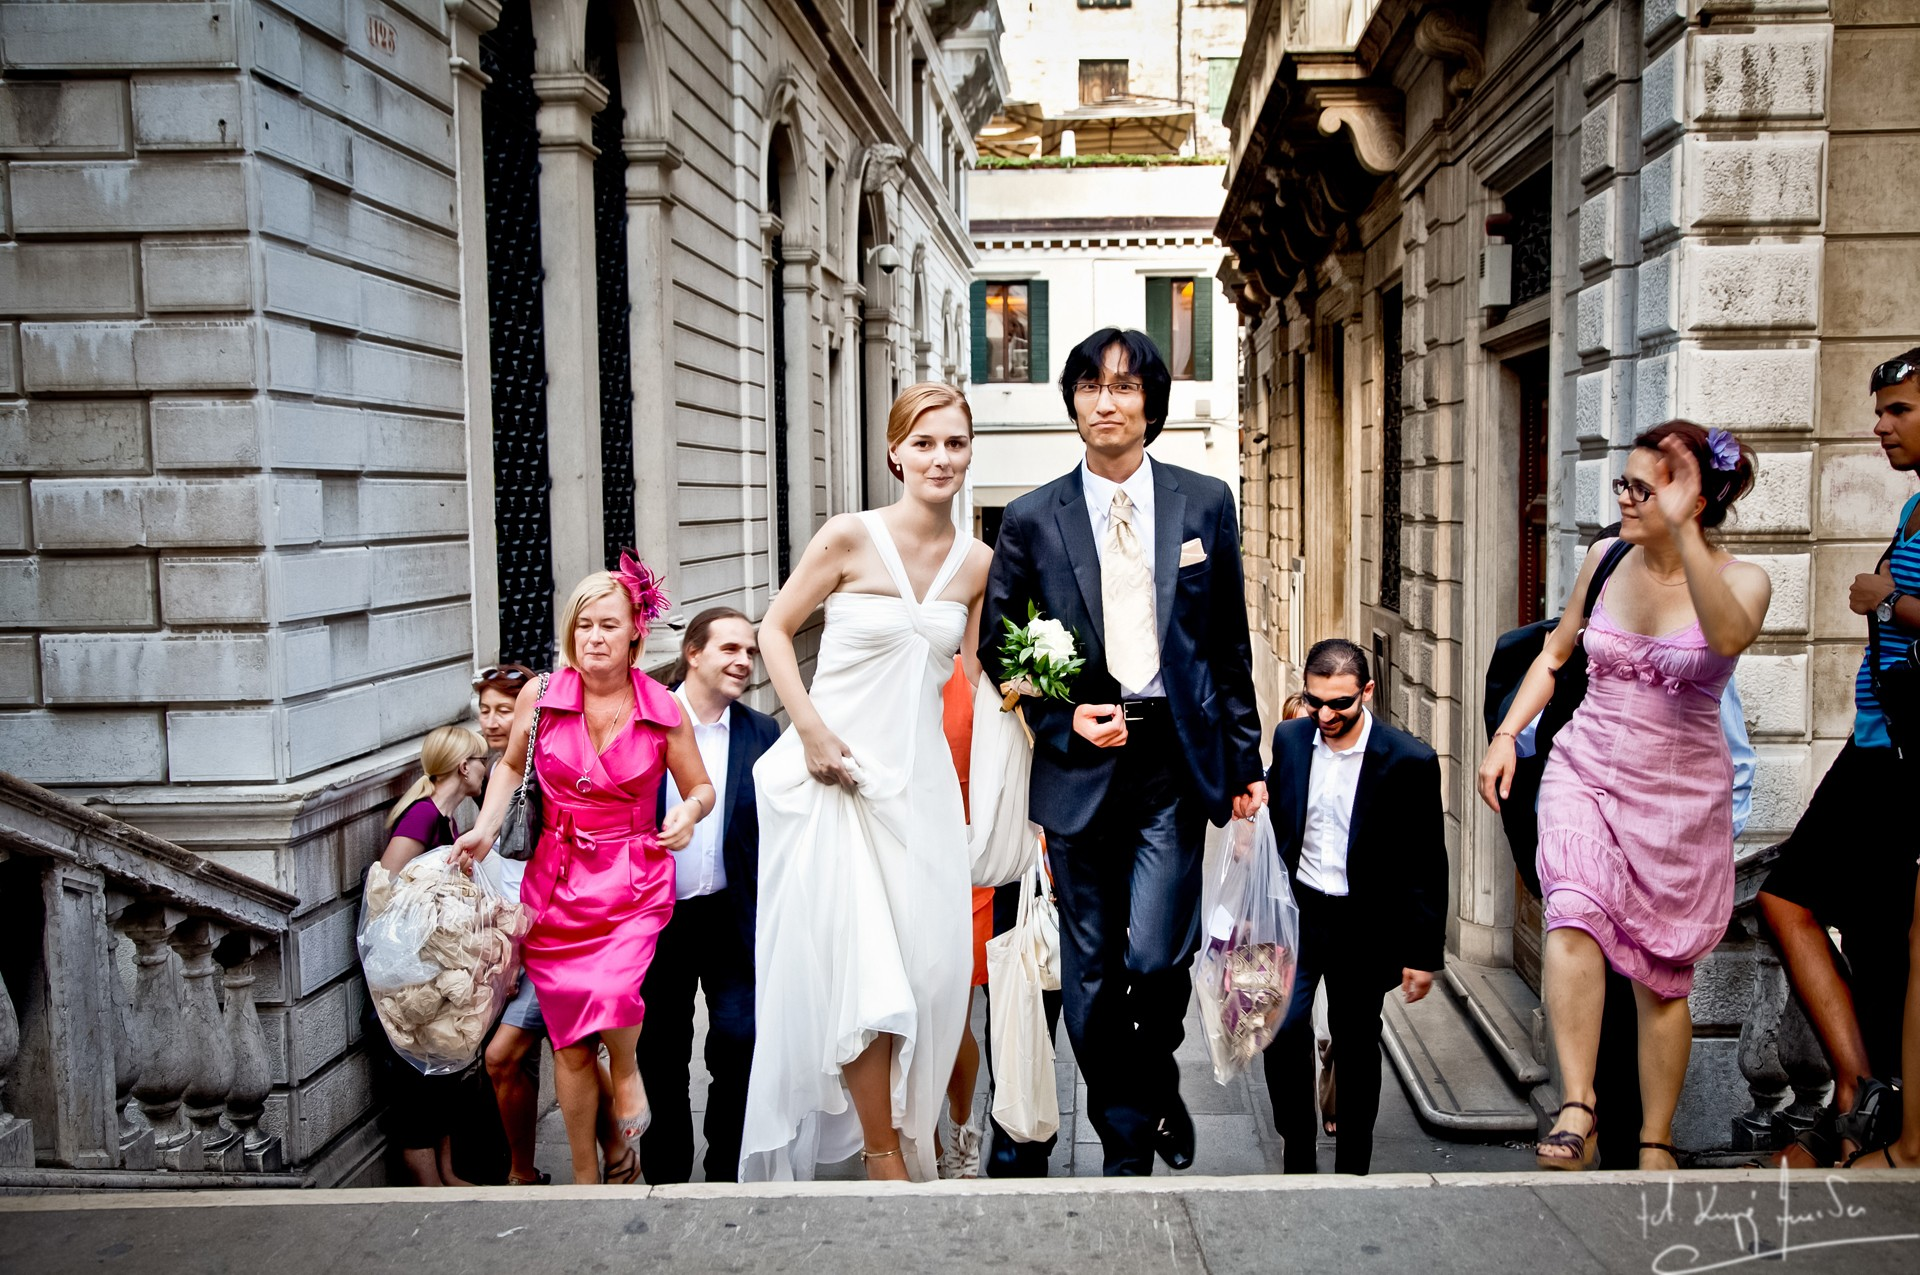 Ślub w wenecji 74 Manuela Luiza & Young Seon Song